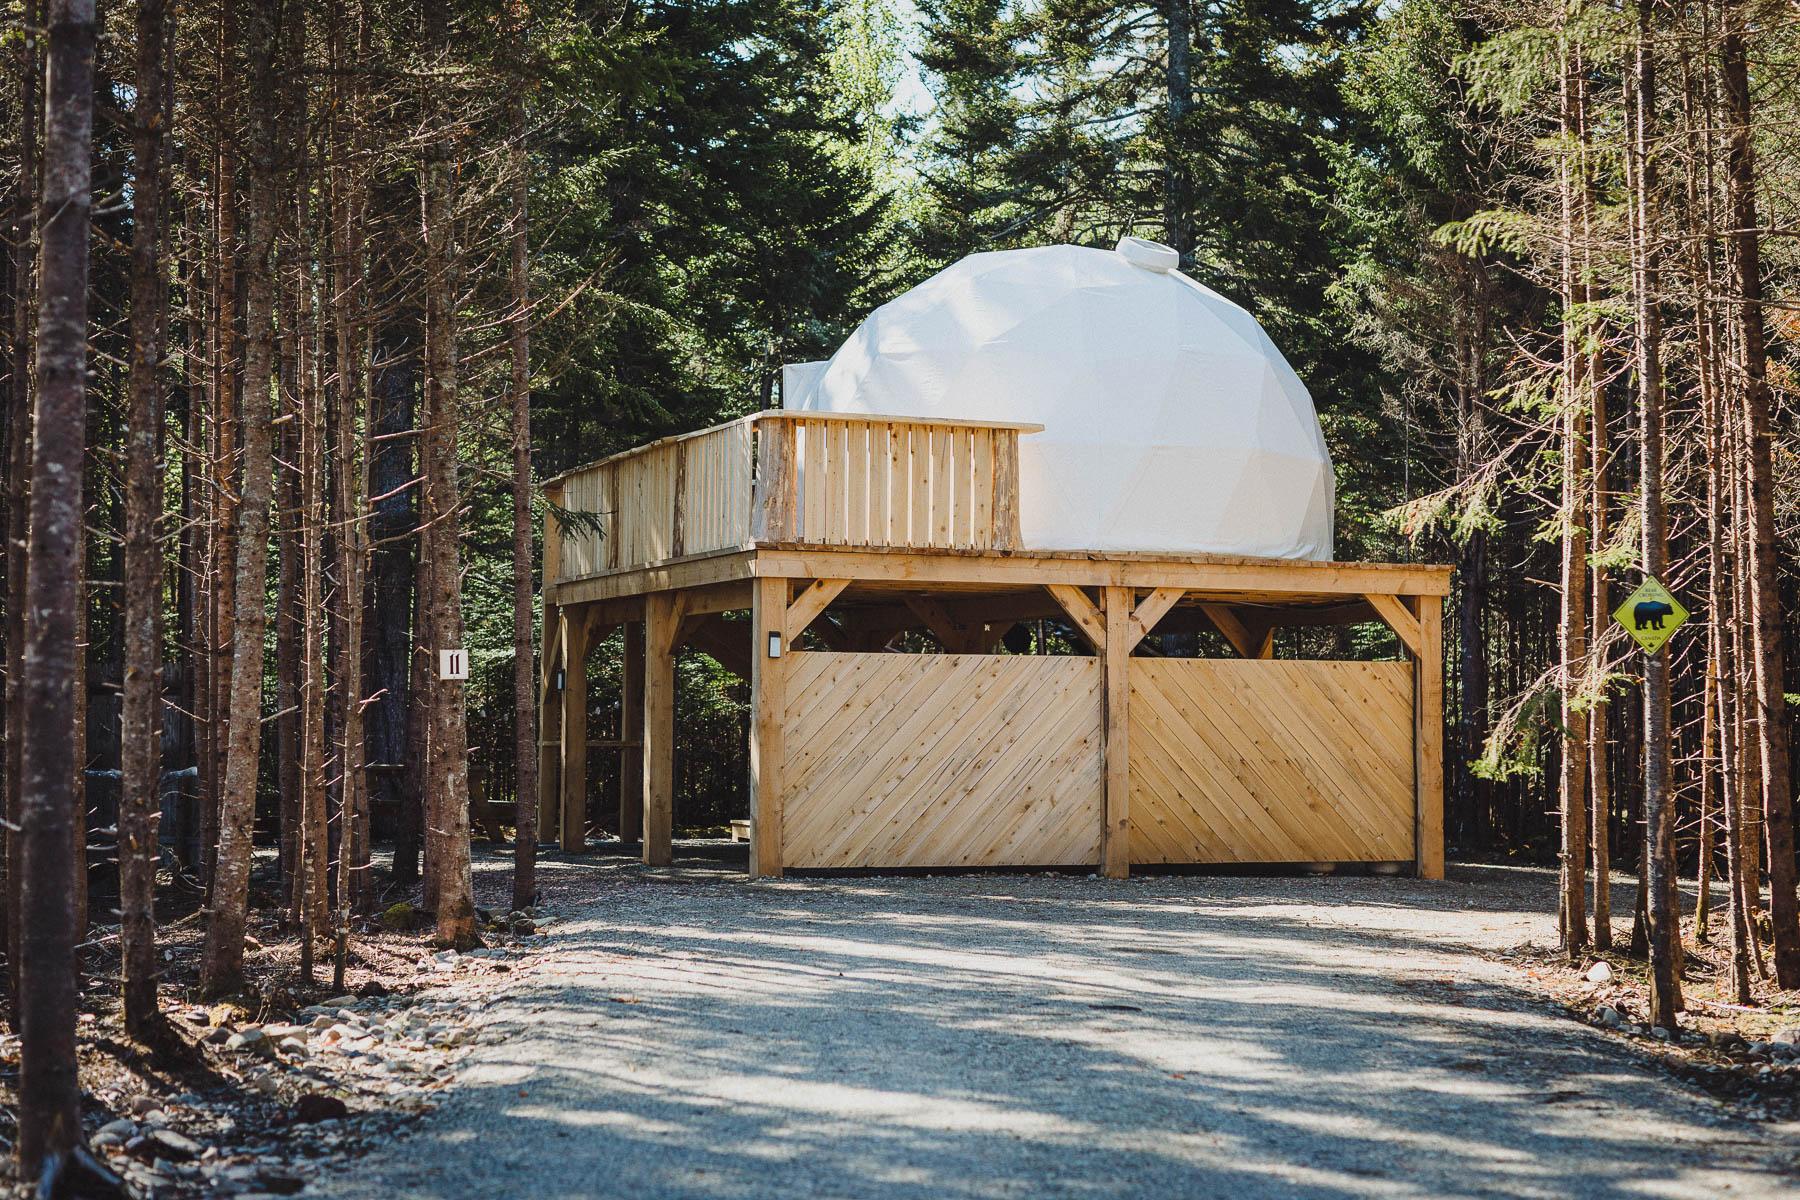 Raised Dome